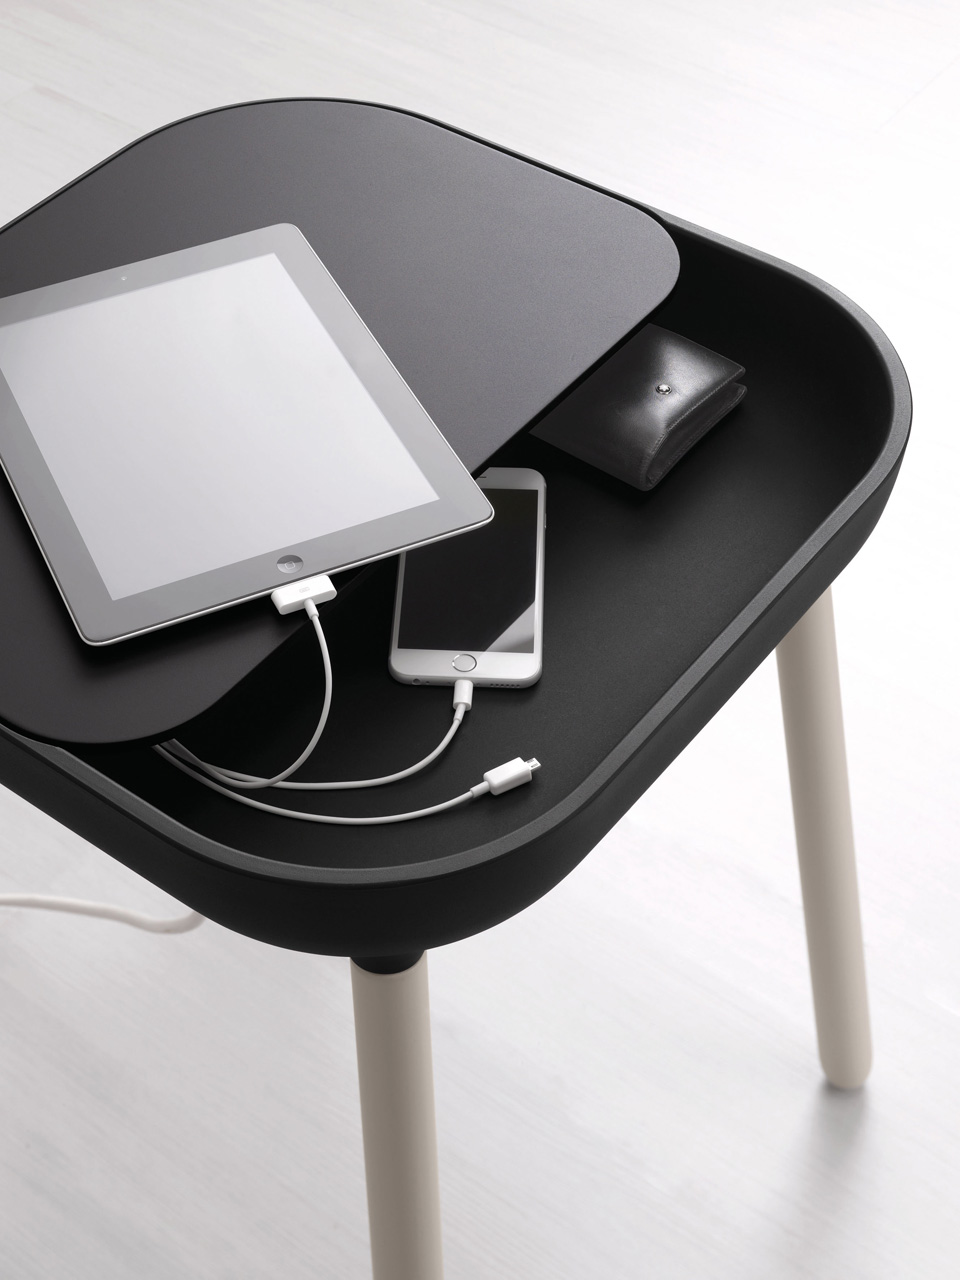 App-Side-Table-hisheji (1)